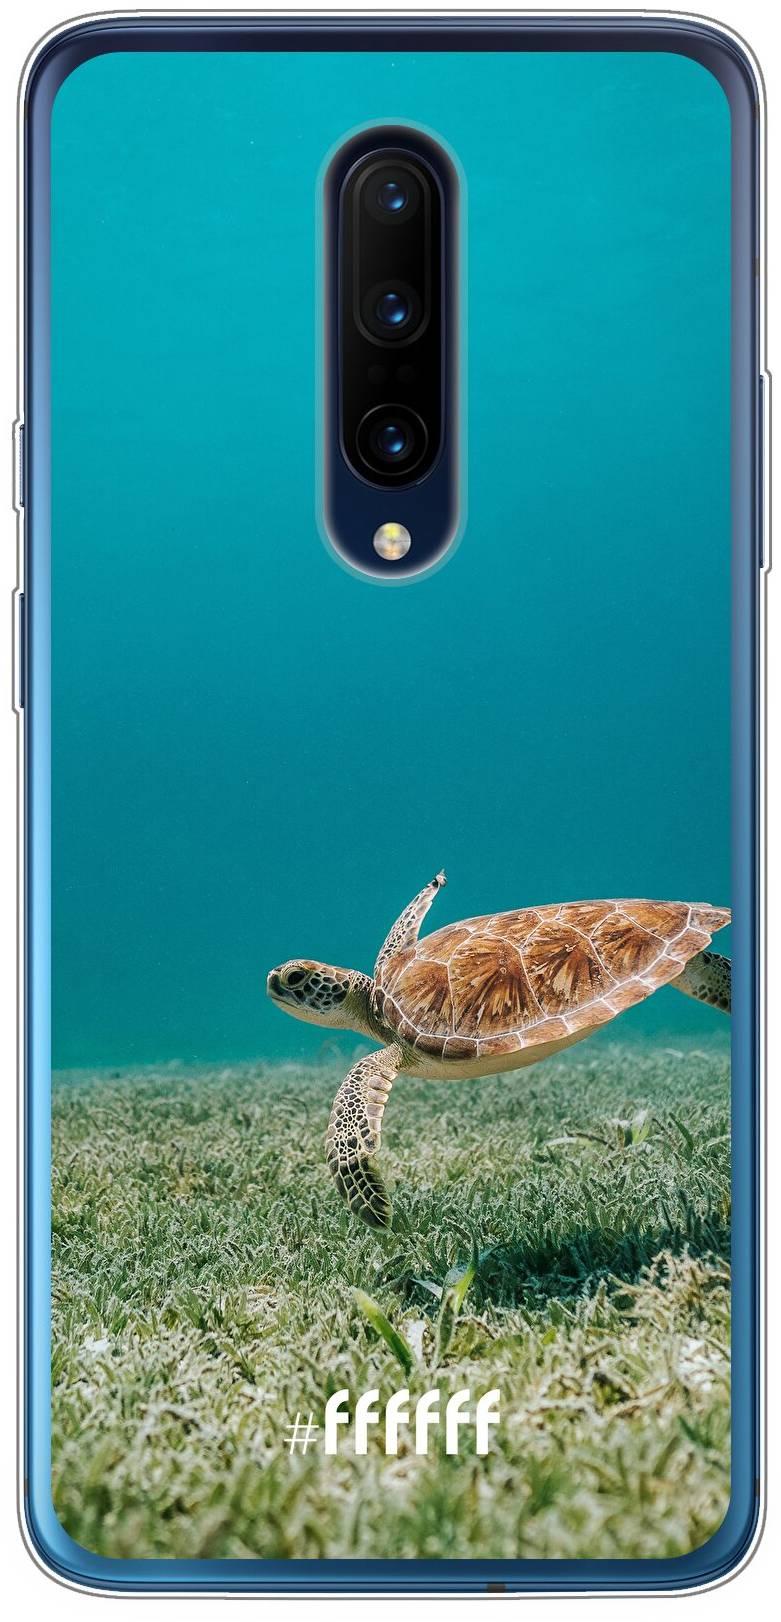 Turtle 7 Pro